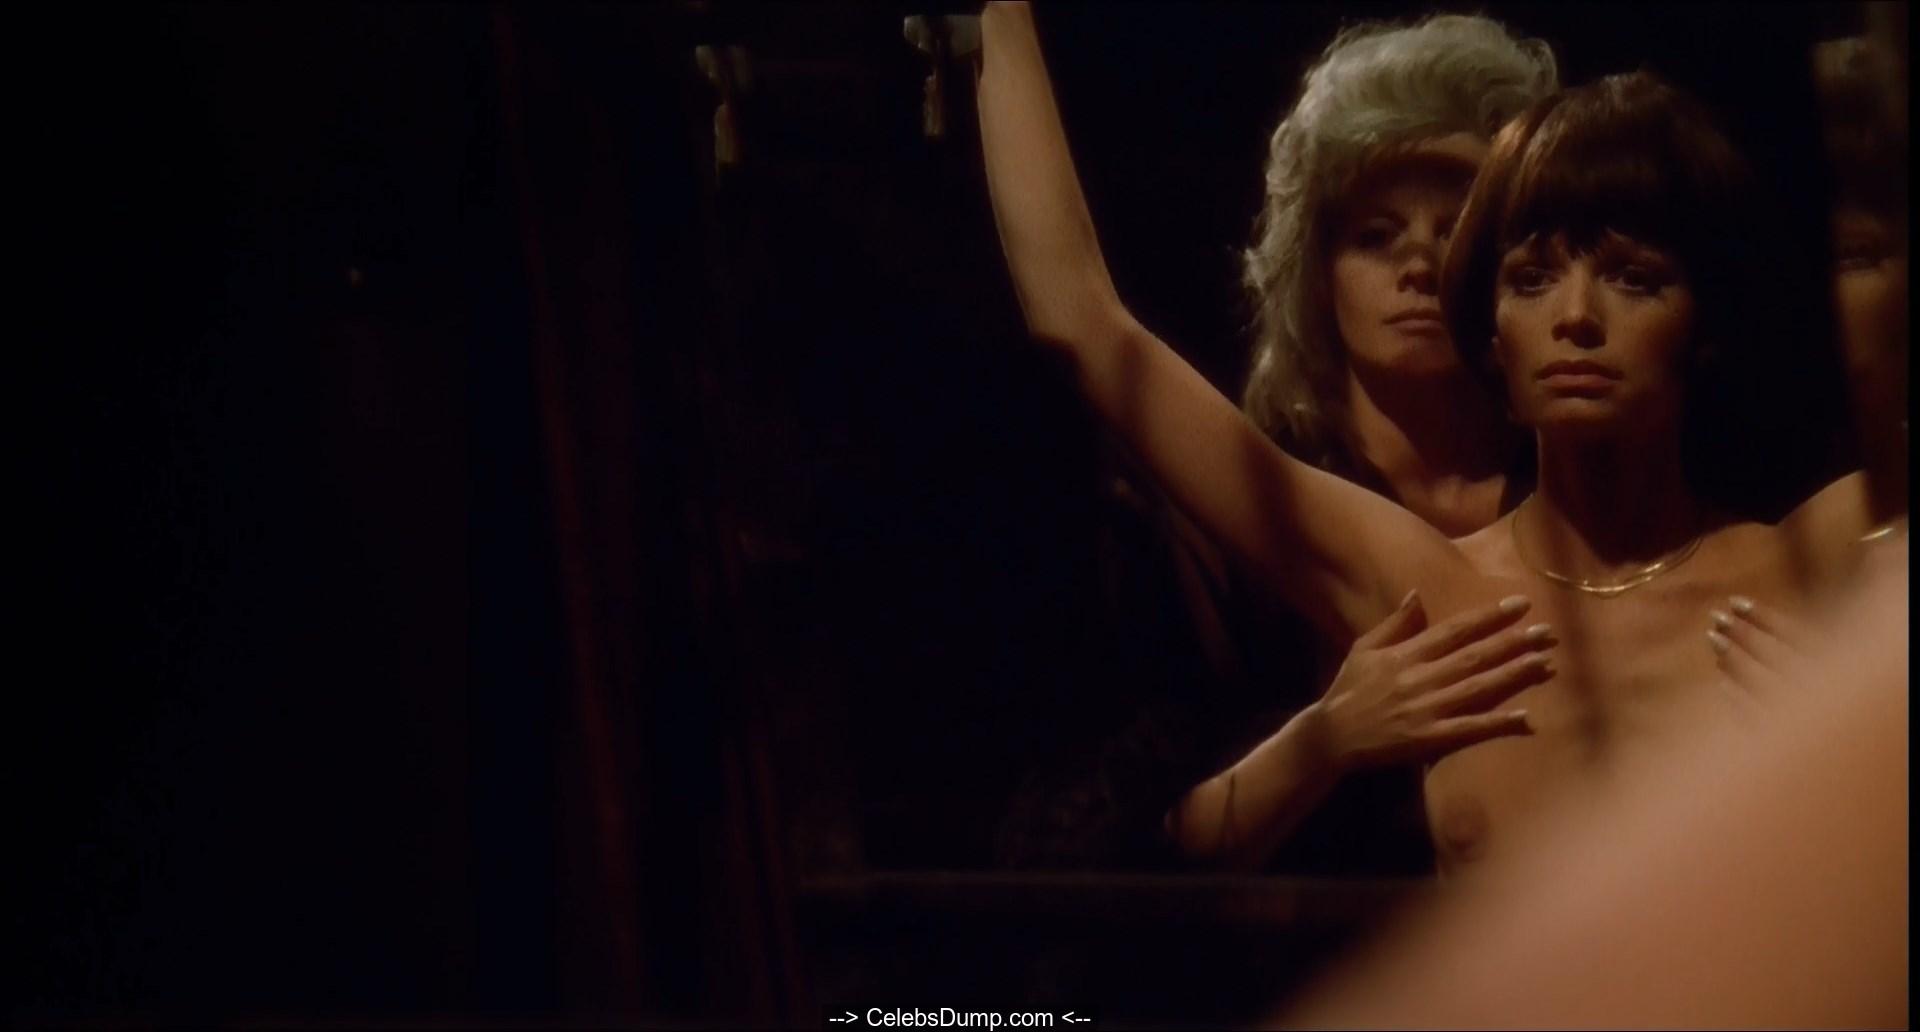 Angela Covello Nude carroll baker, ely galleani, isabelle de funes, angela